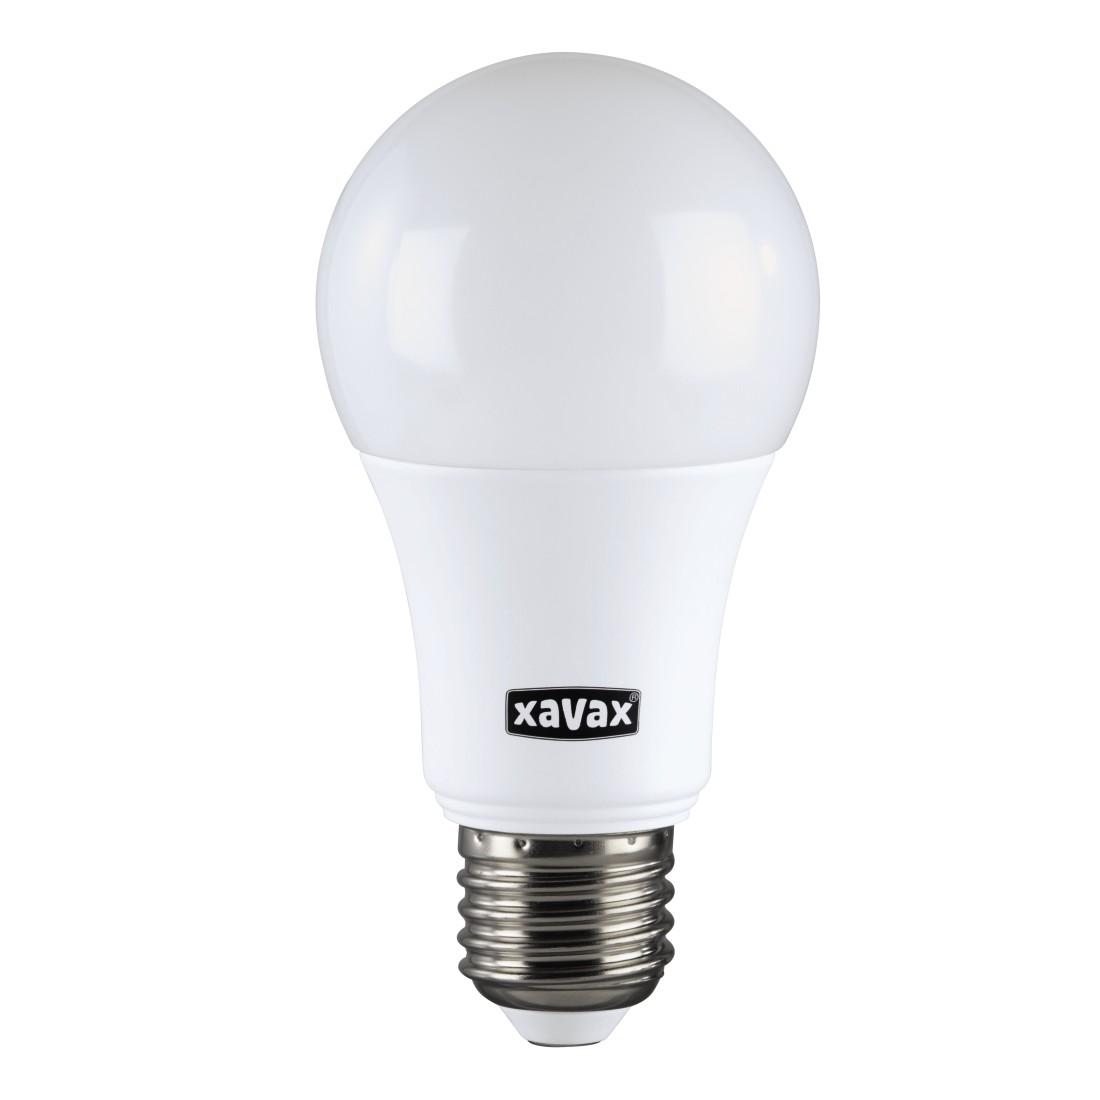 Xavax 00112198 xavax led lampe e27 806lm ersetzt 60w abx druckfhige abbildung xavax led lampe e27 806lm ersetzt 60w glhlampe parisarafo Images